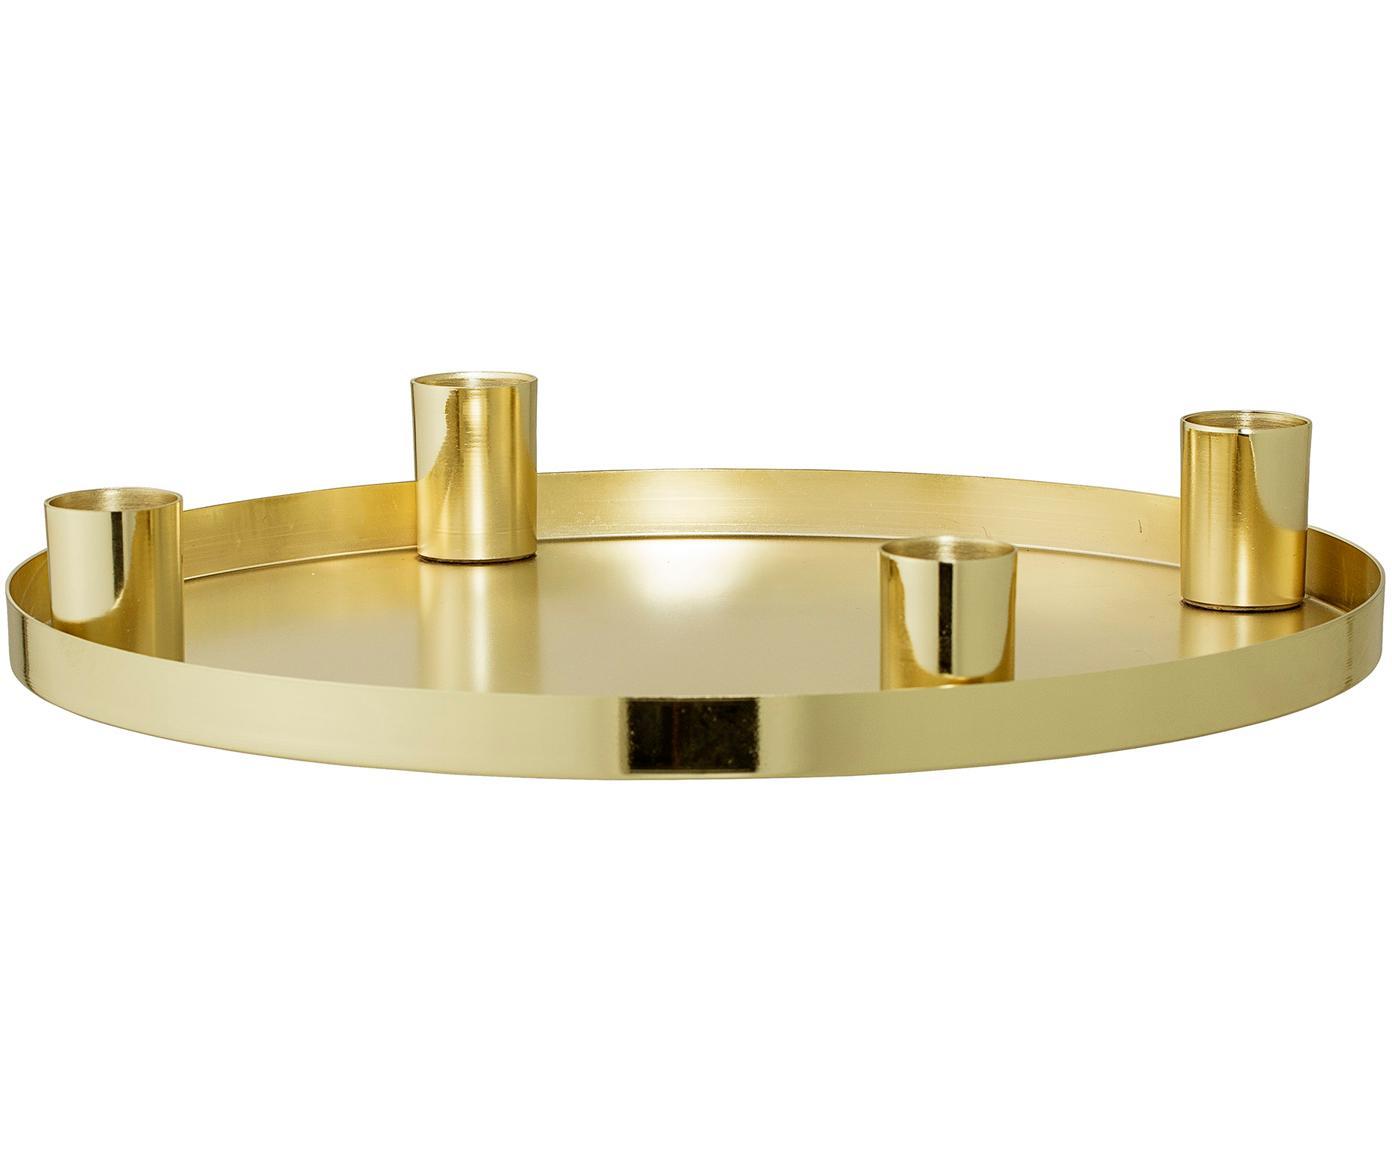 Kaarsenhouder Advent, Gecoat metaal, Goudkleurig, Ø 25 x H 4 cm